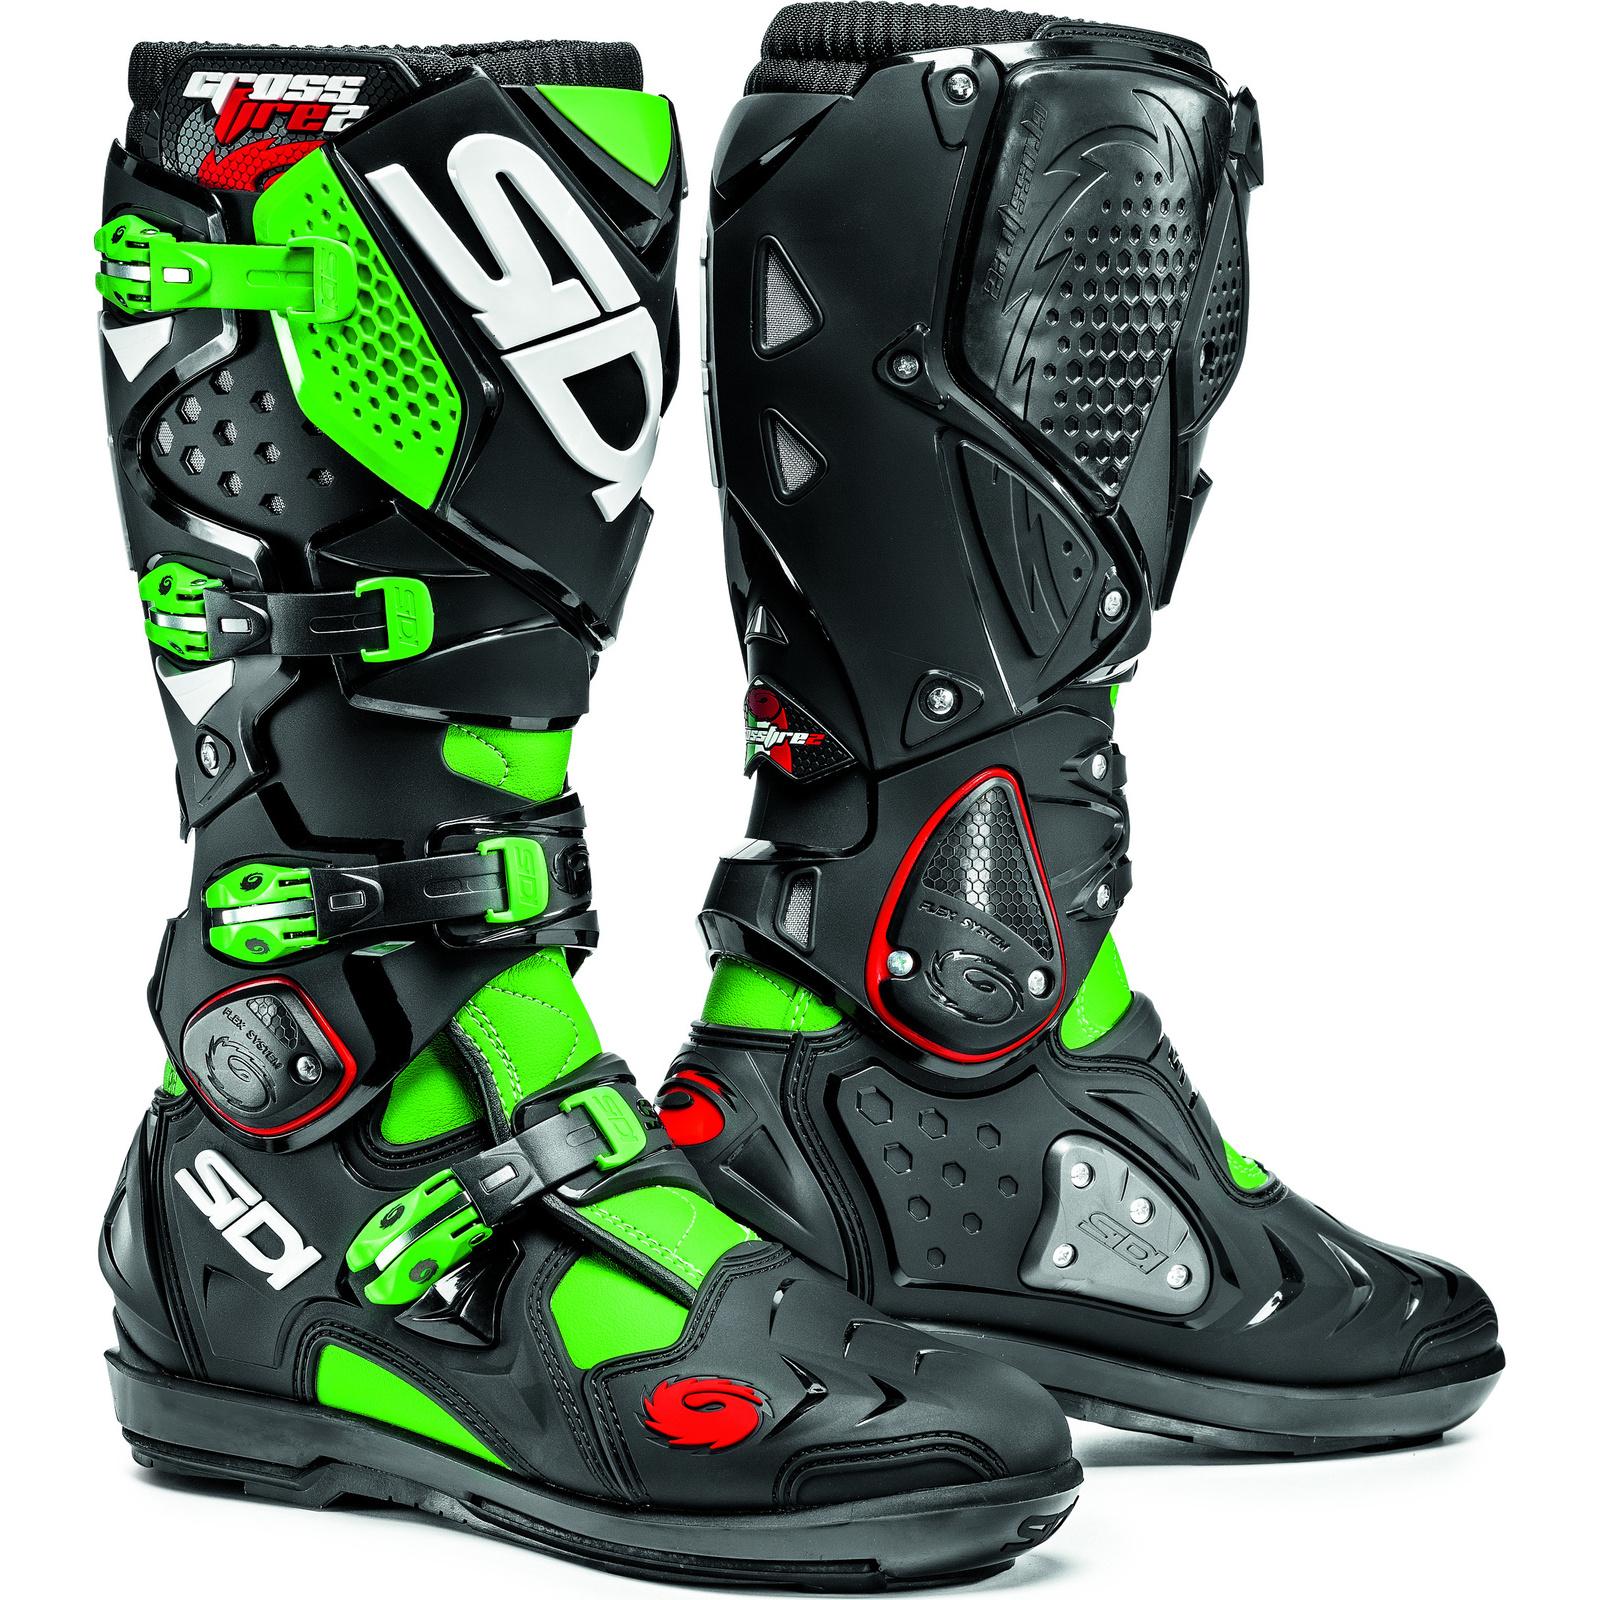 Sidi Crossfire 2 Srs Motocross Boots Dirt Bike Moto X Quad